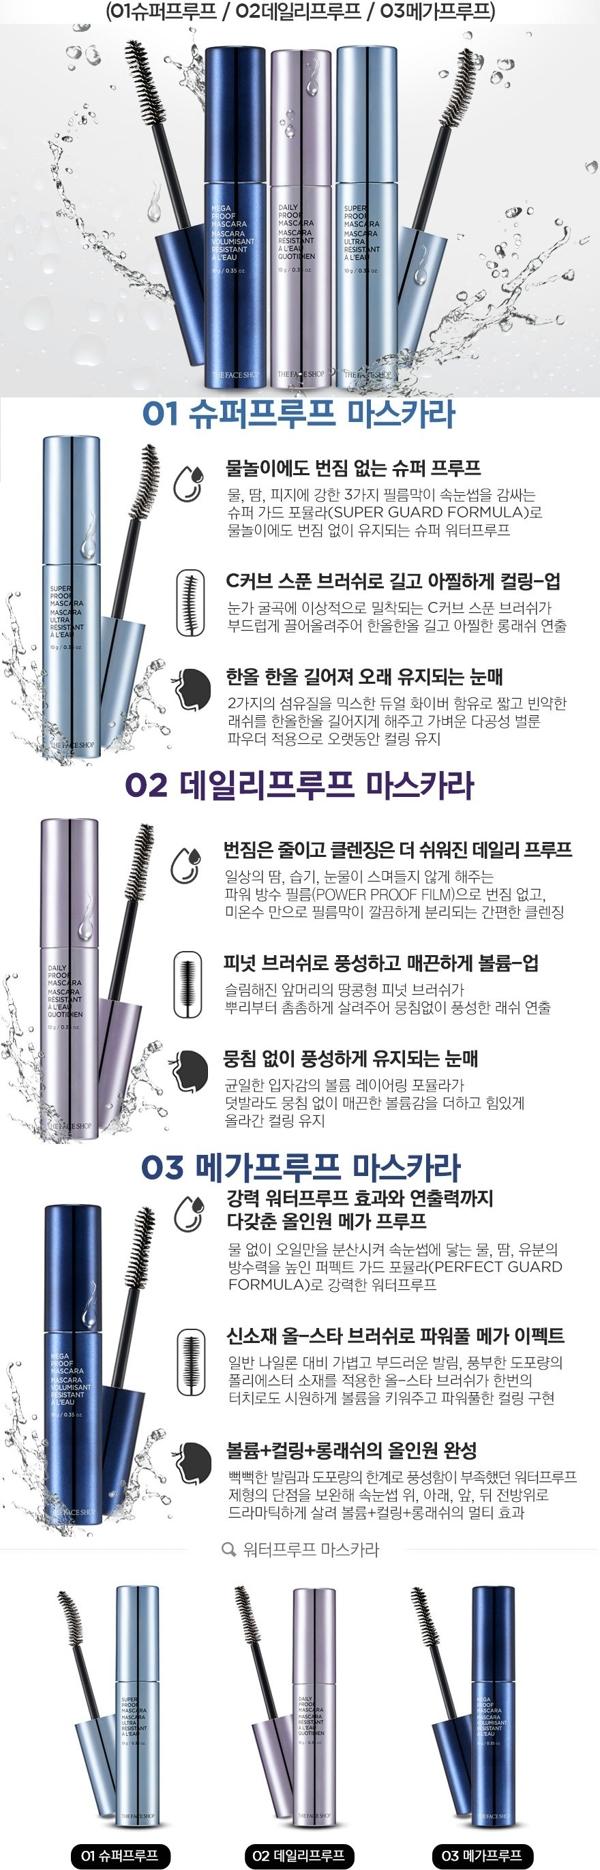 Chut Mi Khong Troi Super Proof Mascara The Face Shop (3)